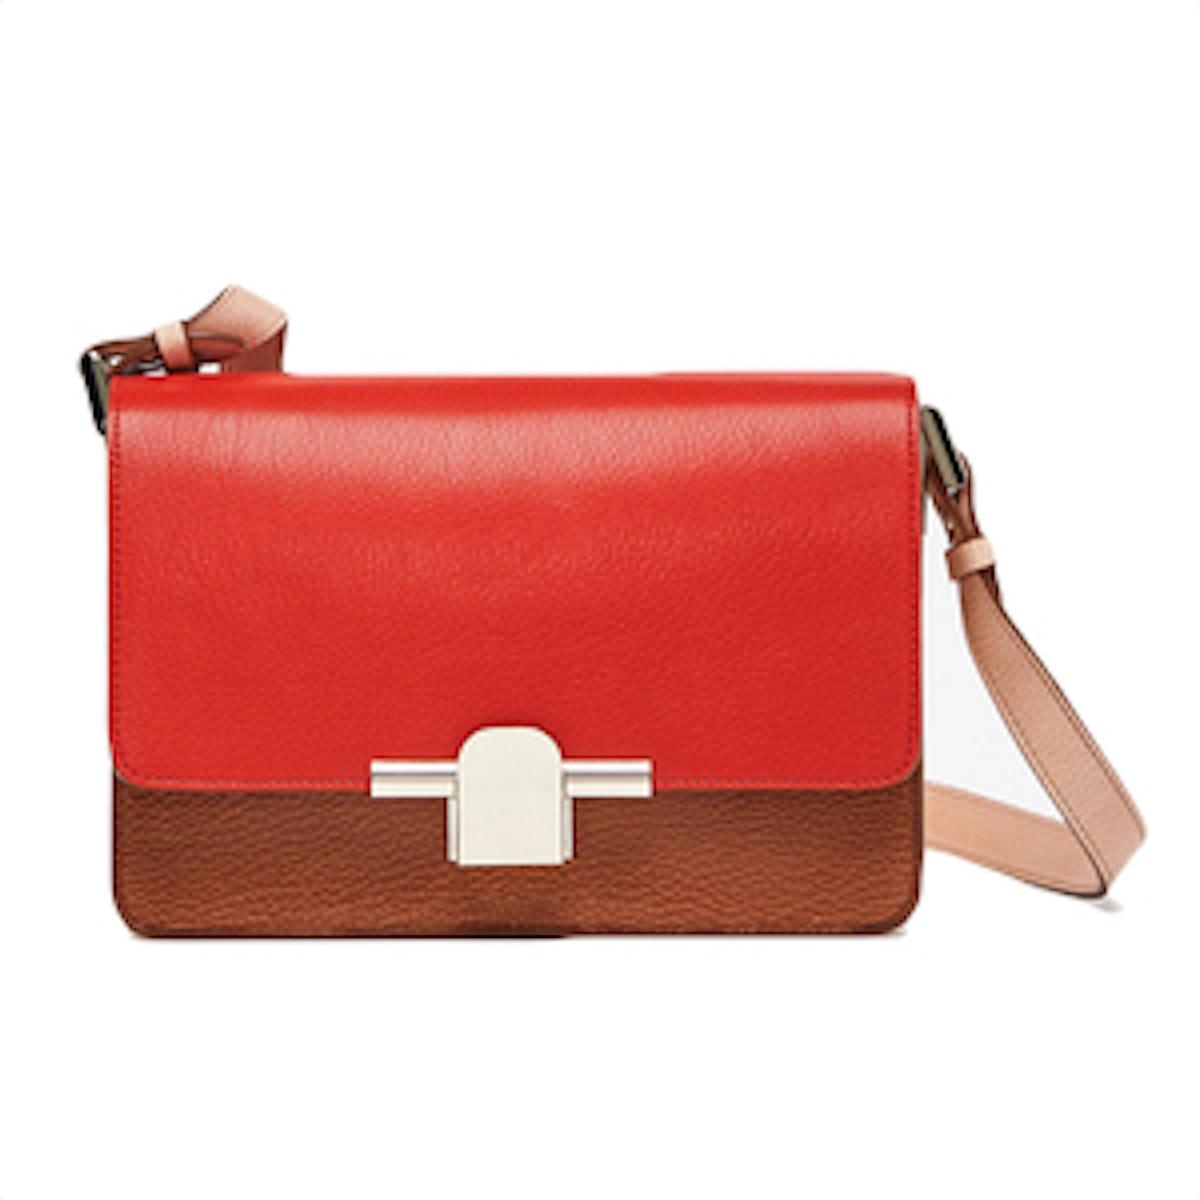 Tricolor Crossbody Bag